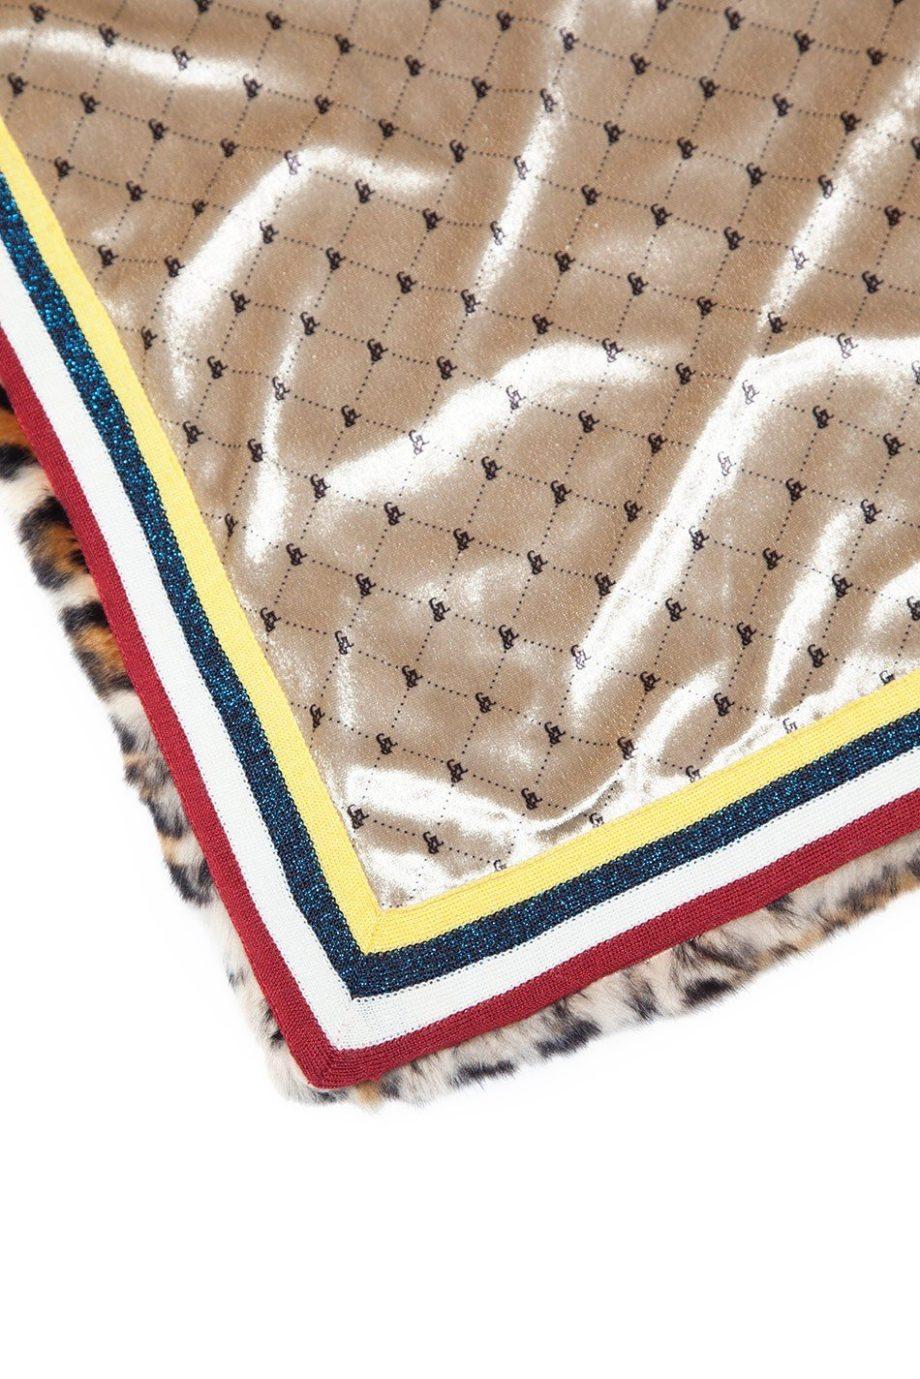 G&L Cozy Cheetah Blanket